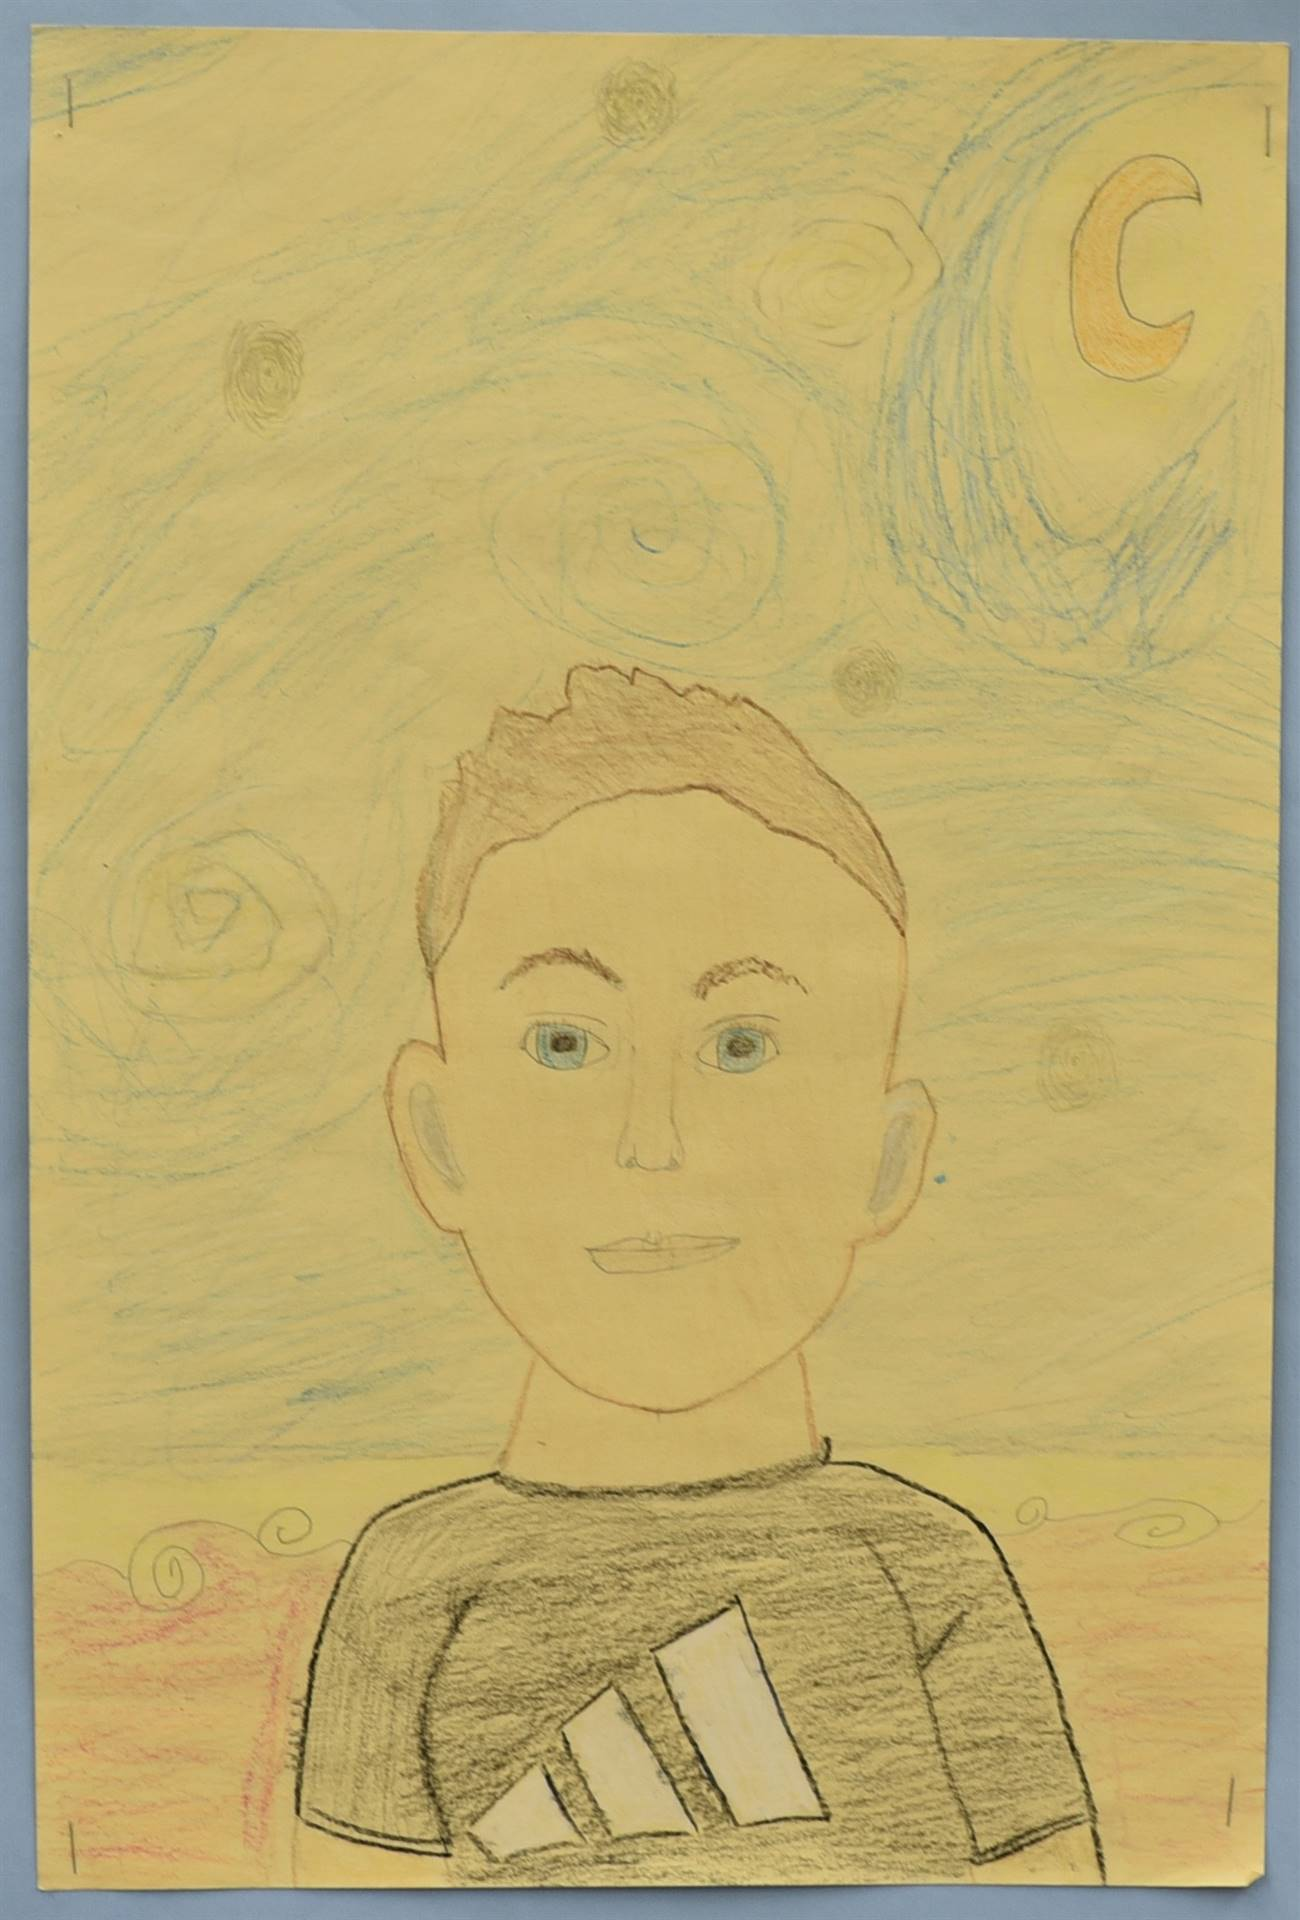 Brecksville-Broadview Hts. Middle School Art Projects 186